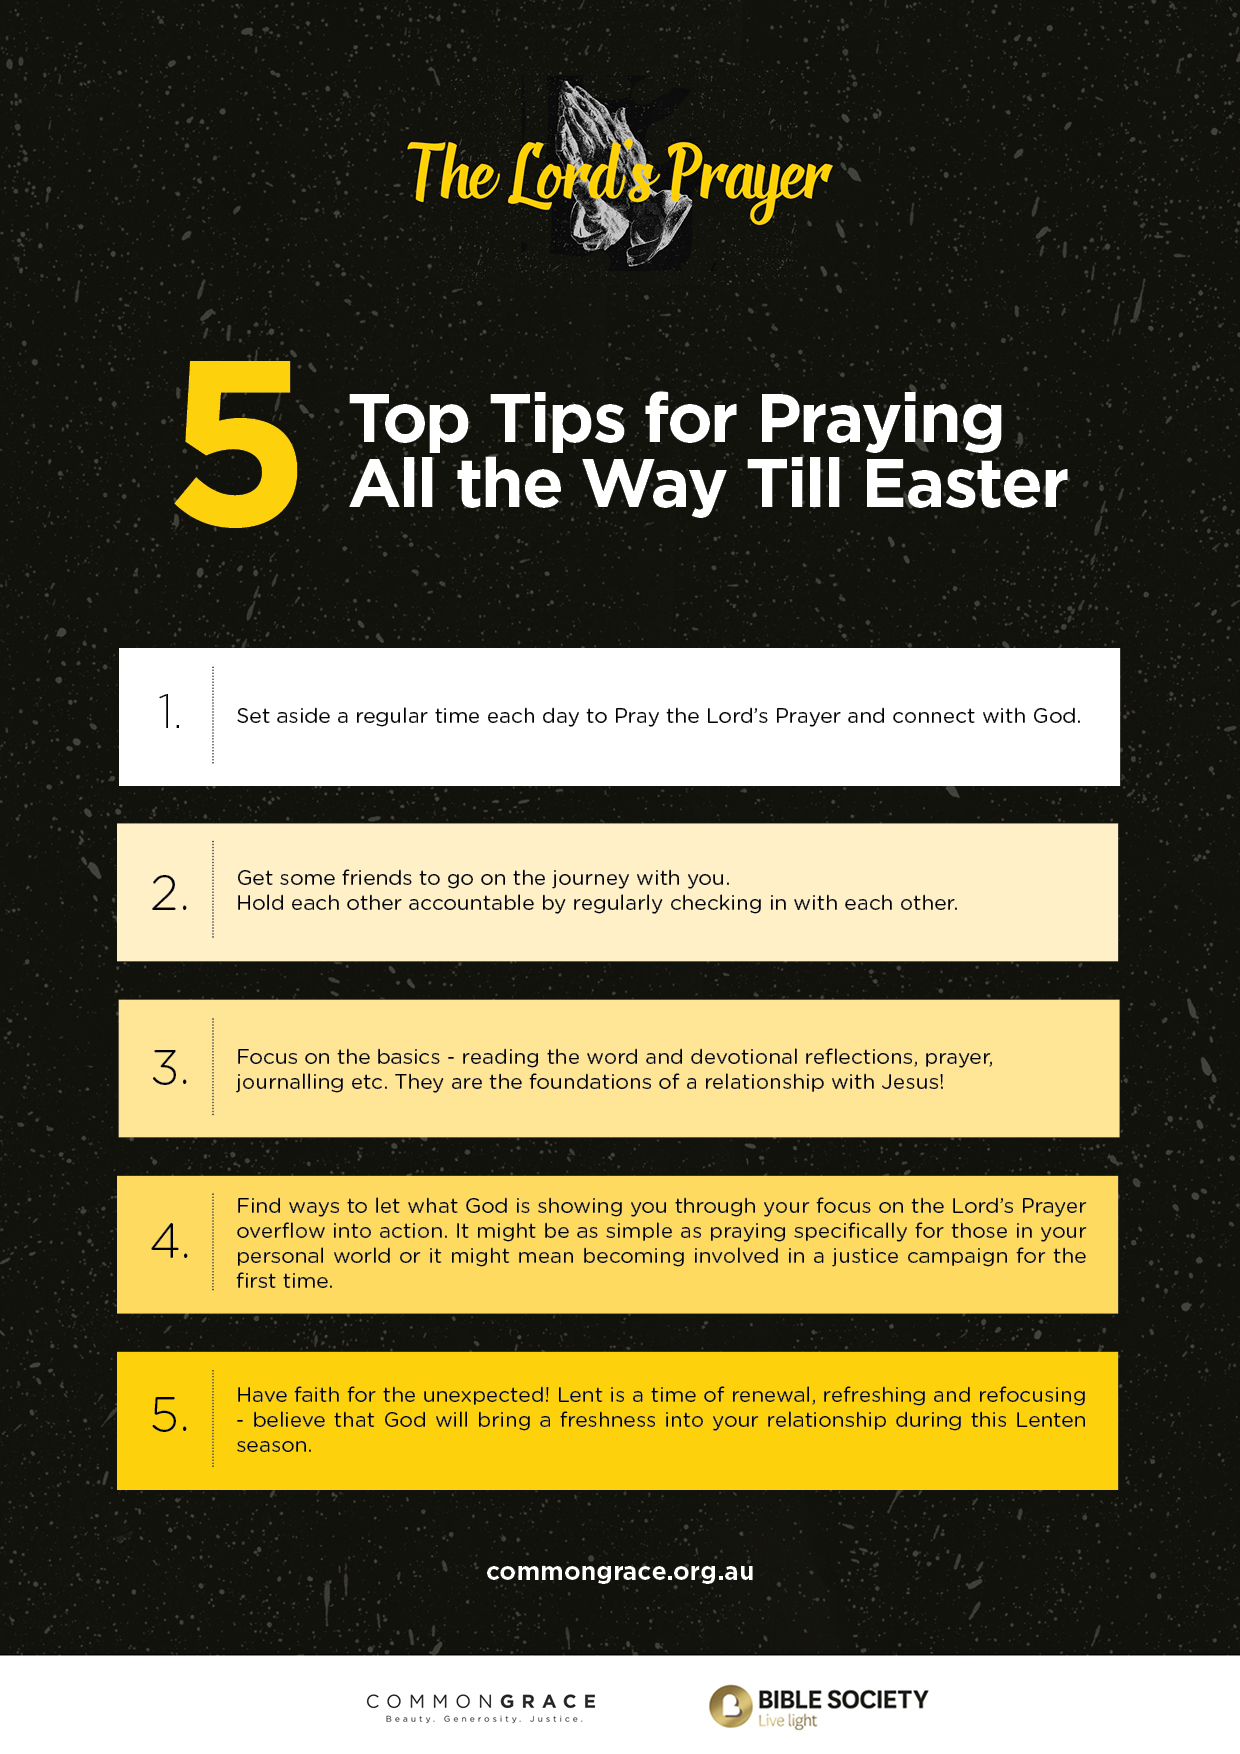 5_Top_Tips.jpg